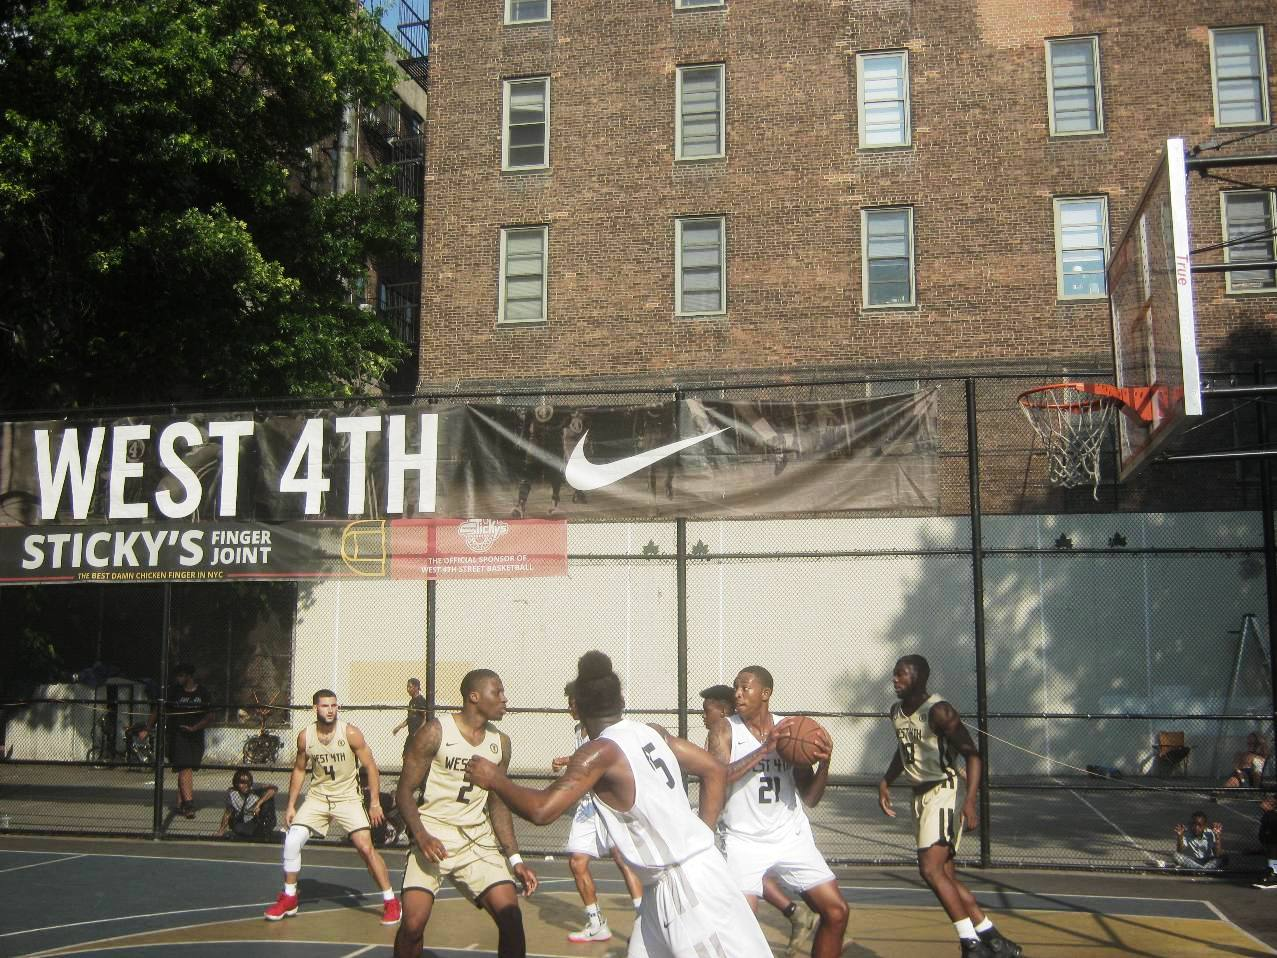 West 4th Streetコート